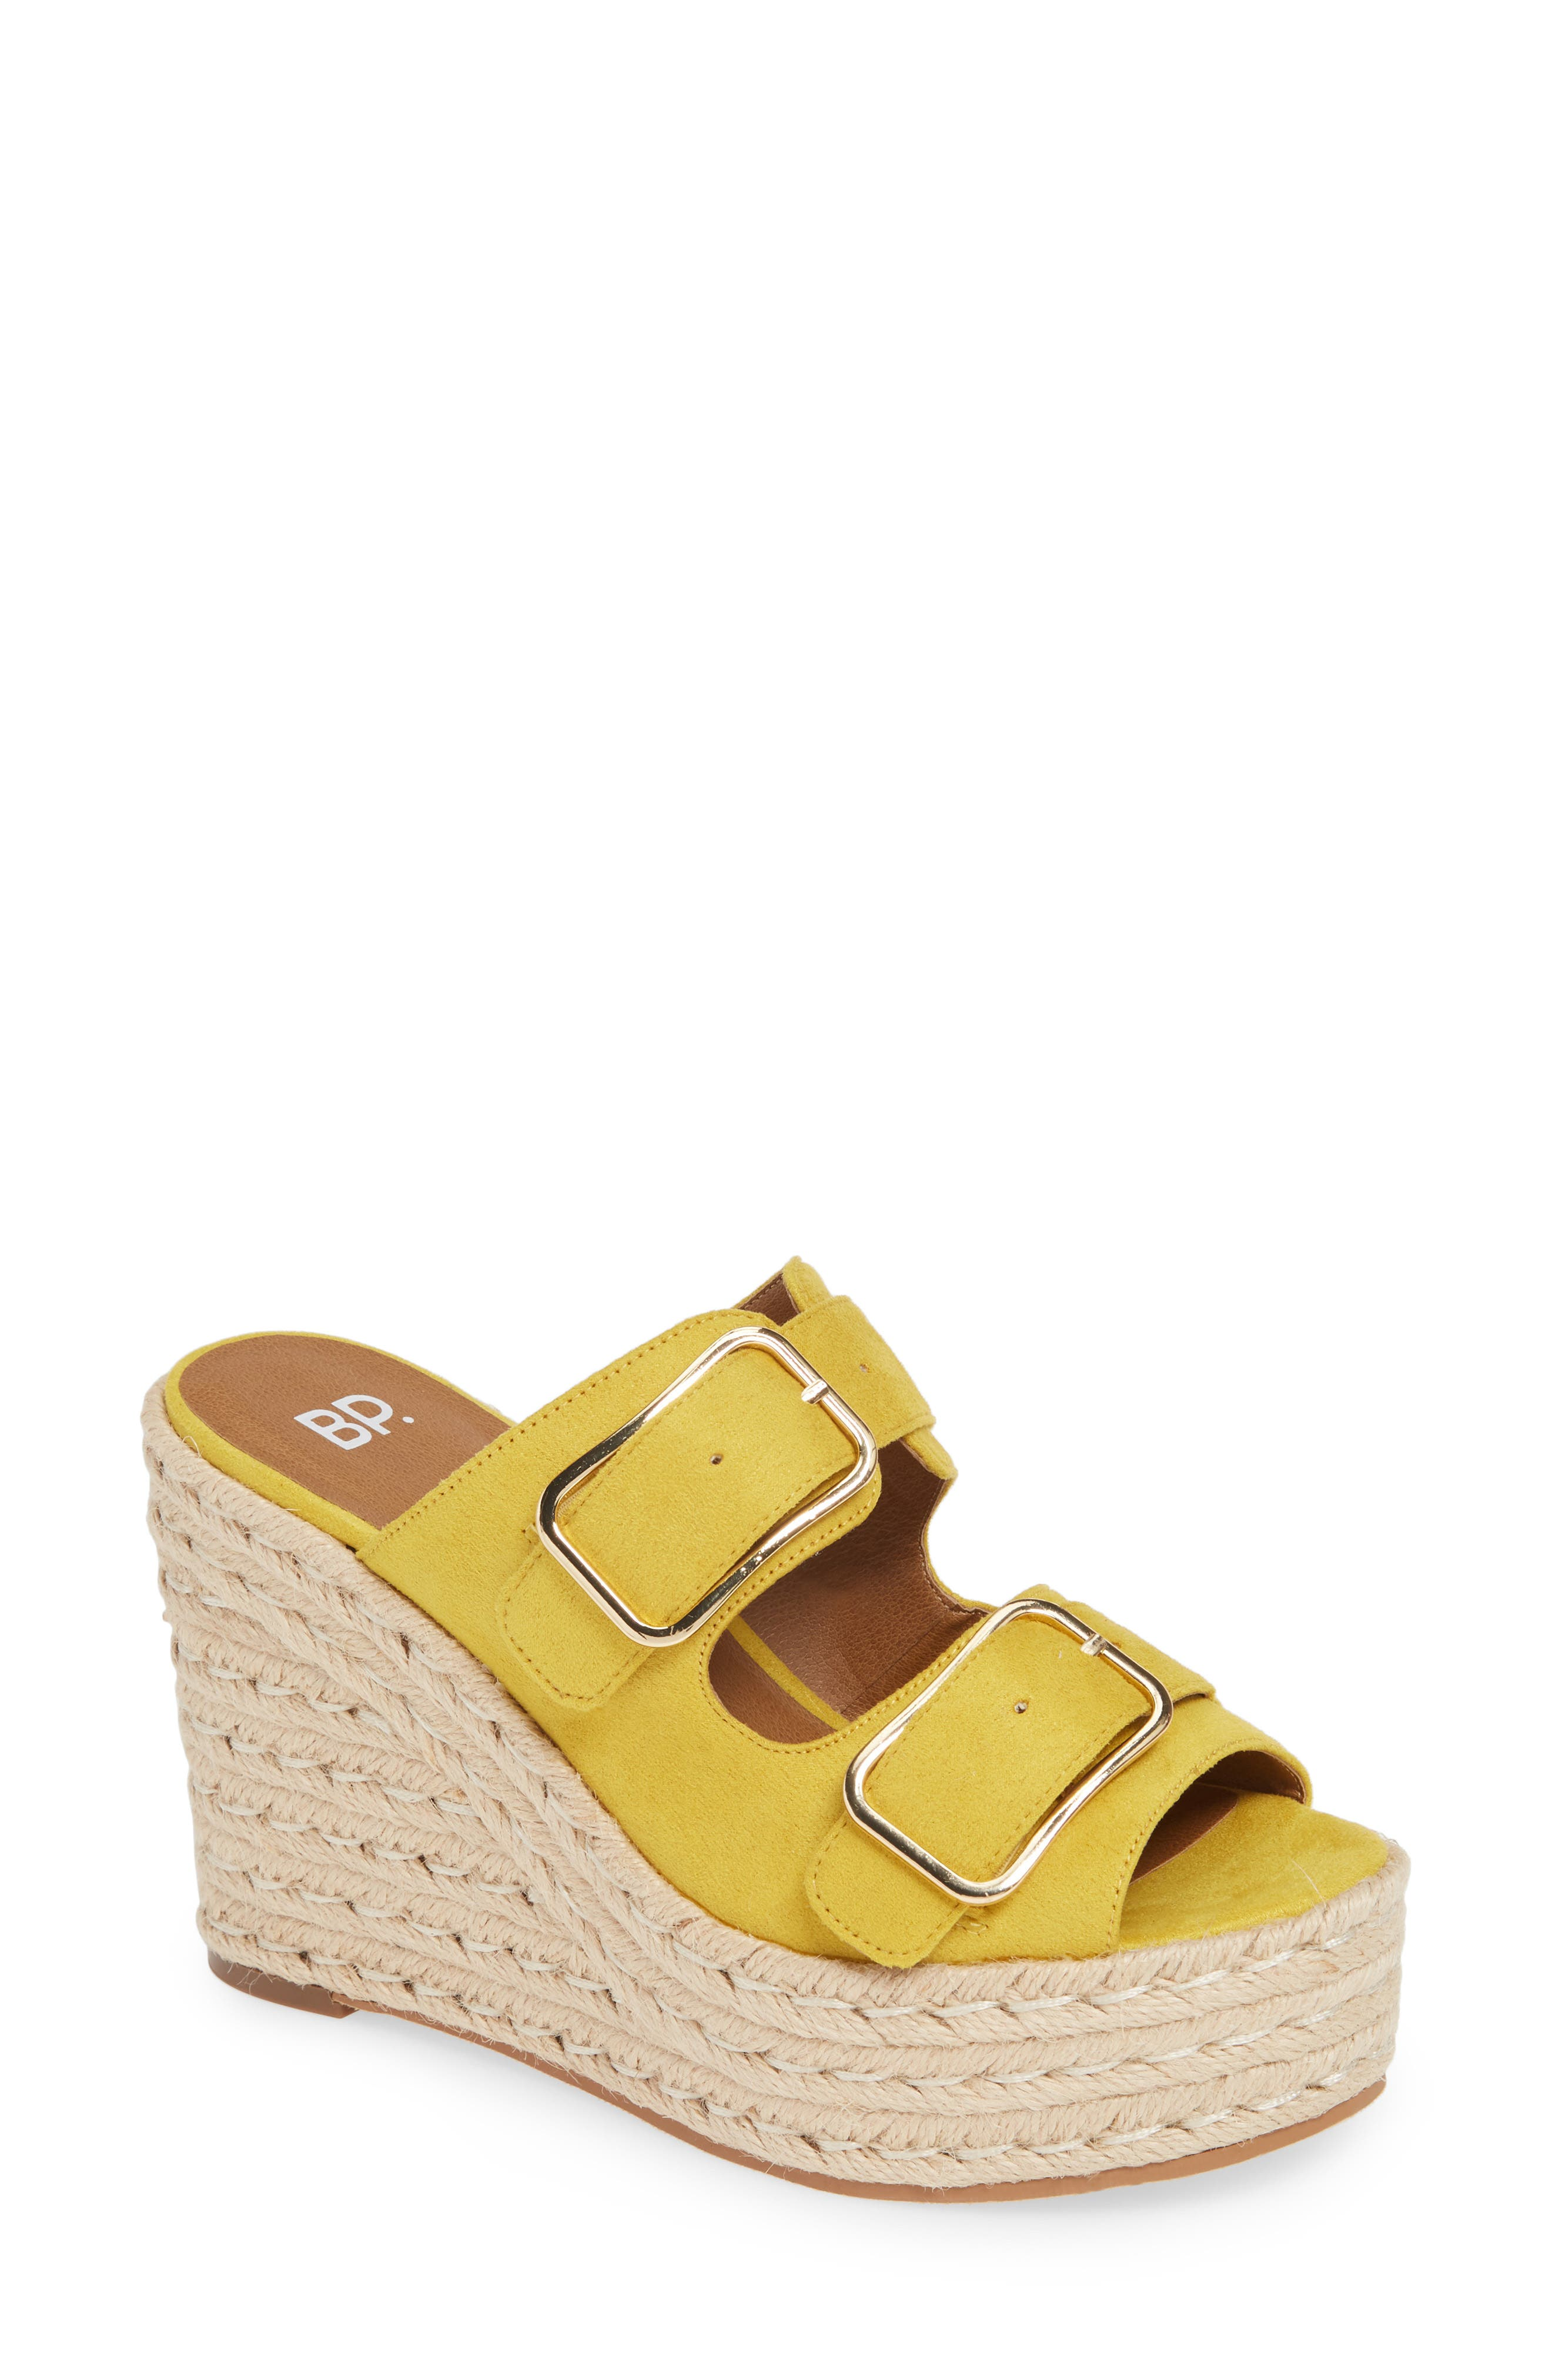 BP. Dani Espadrille Wedge Sandal, Main, color, YELLOW FAUX SUEDE